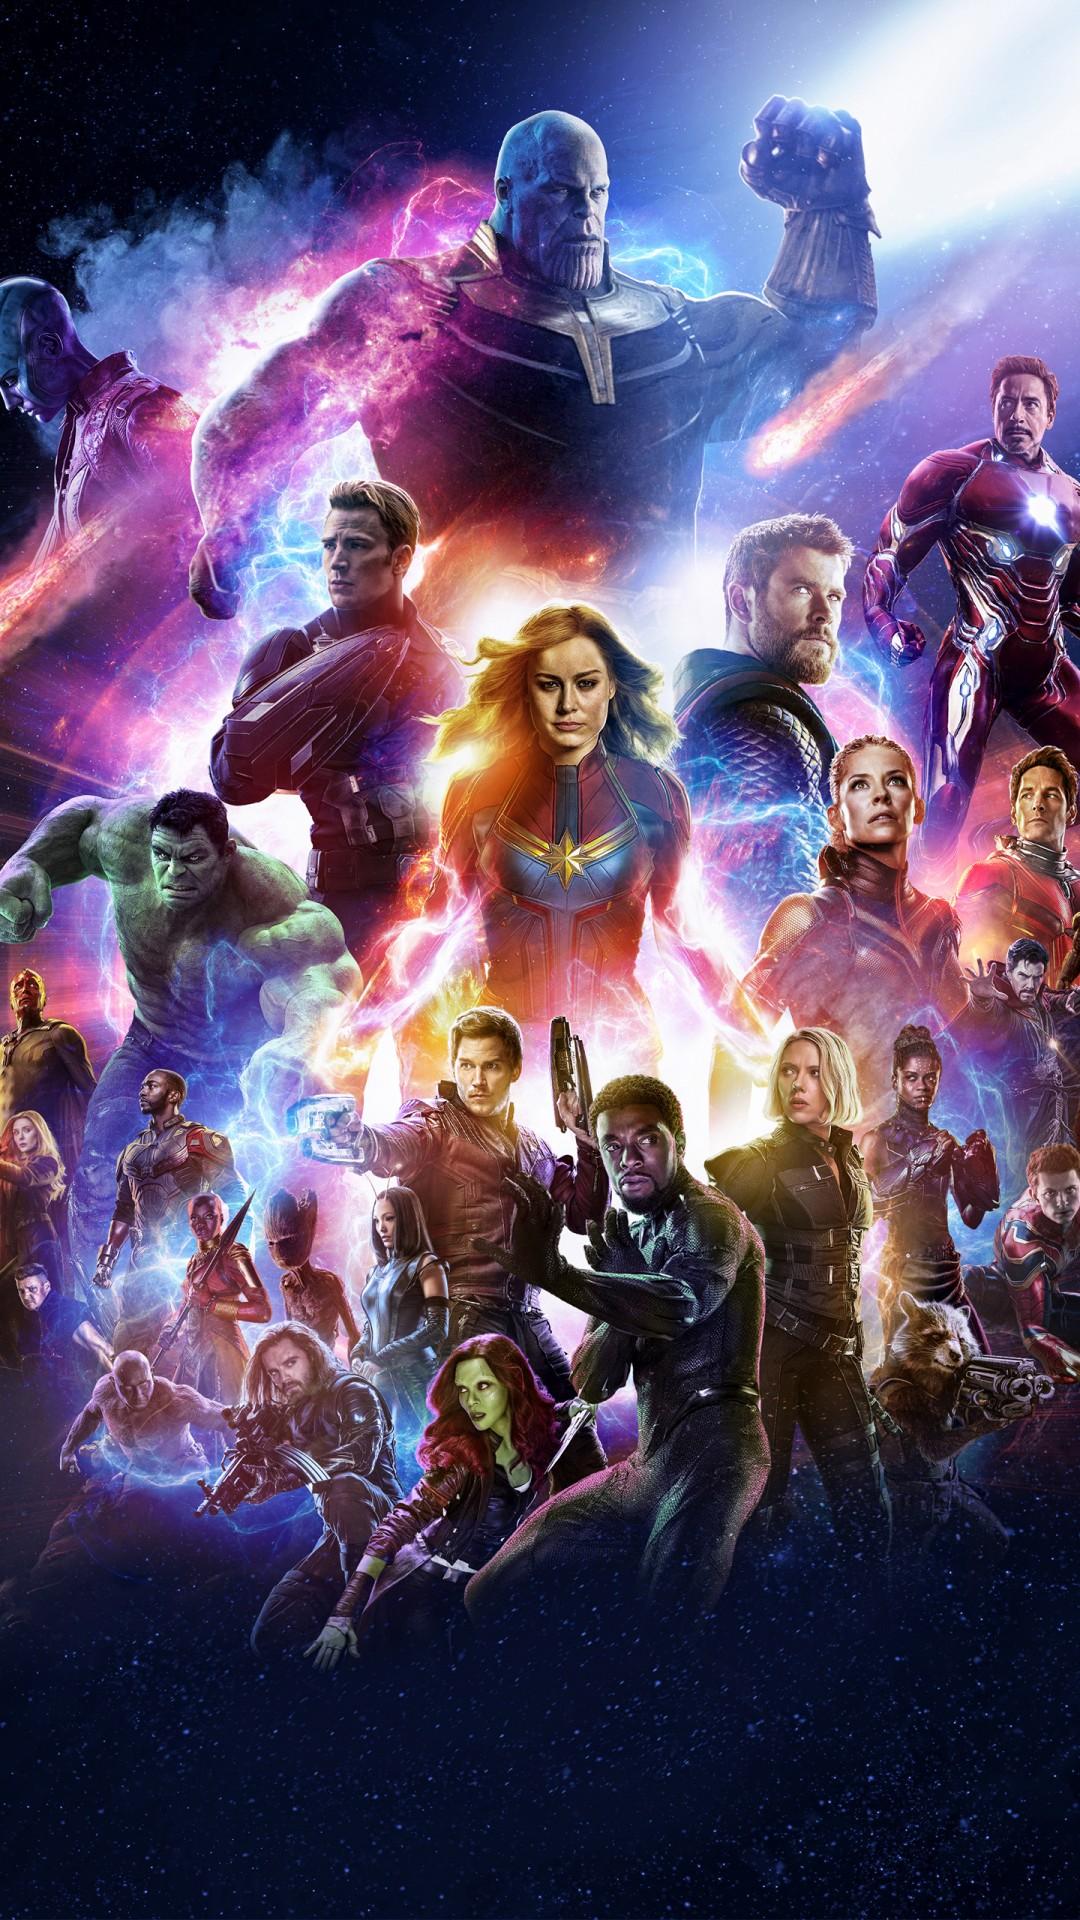 Star War Wallpaper Iphone 6 Avengers 4 Wallpapers Hd Wallpapers Id 25849